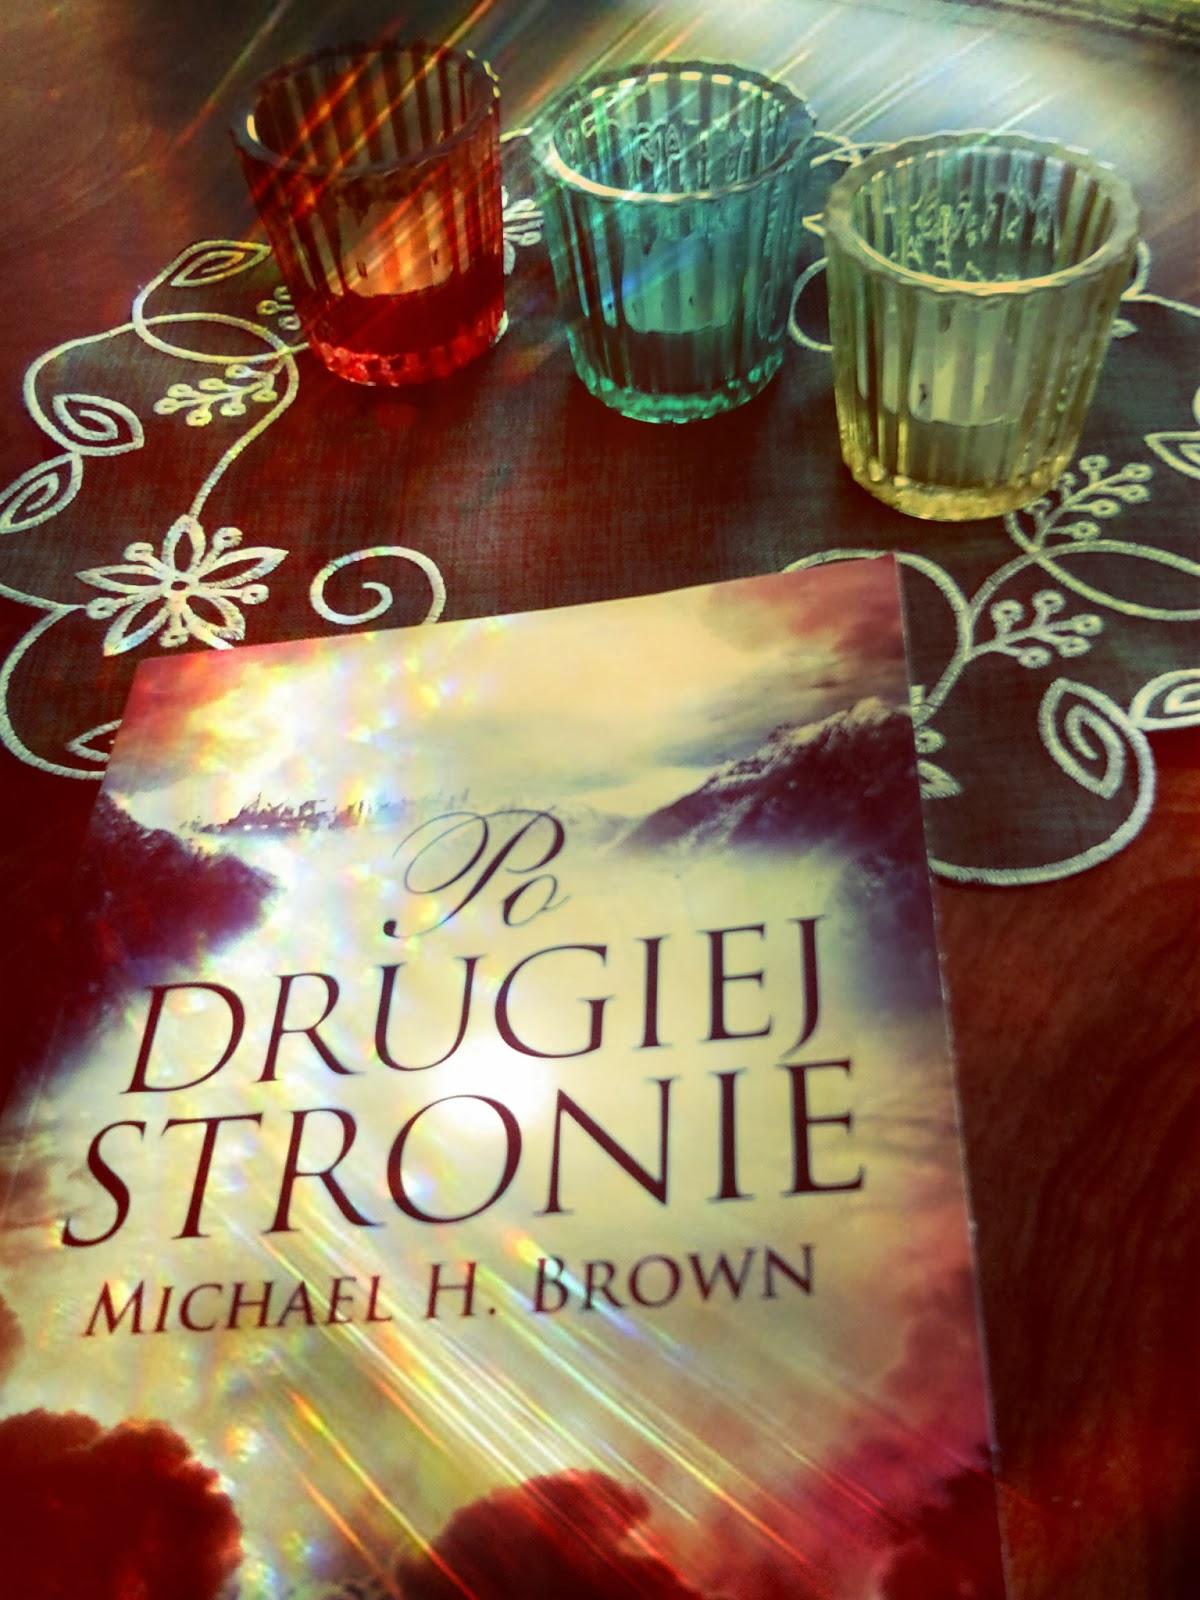 "Michael H. Brown ""Po drugiej stronie"""